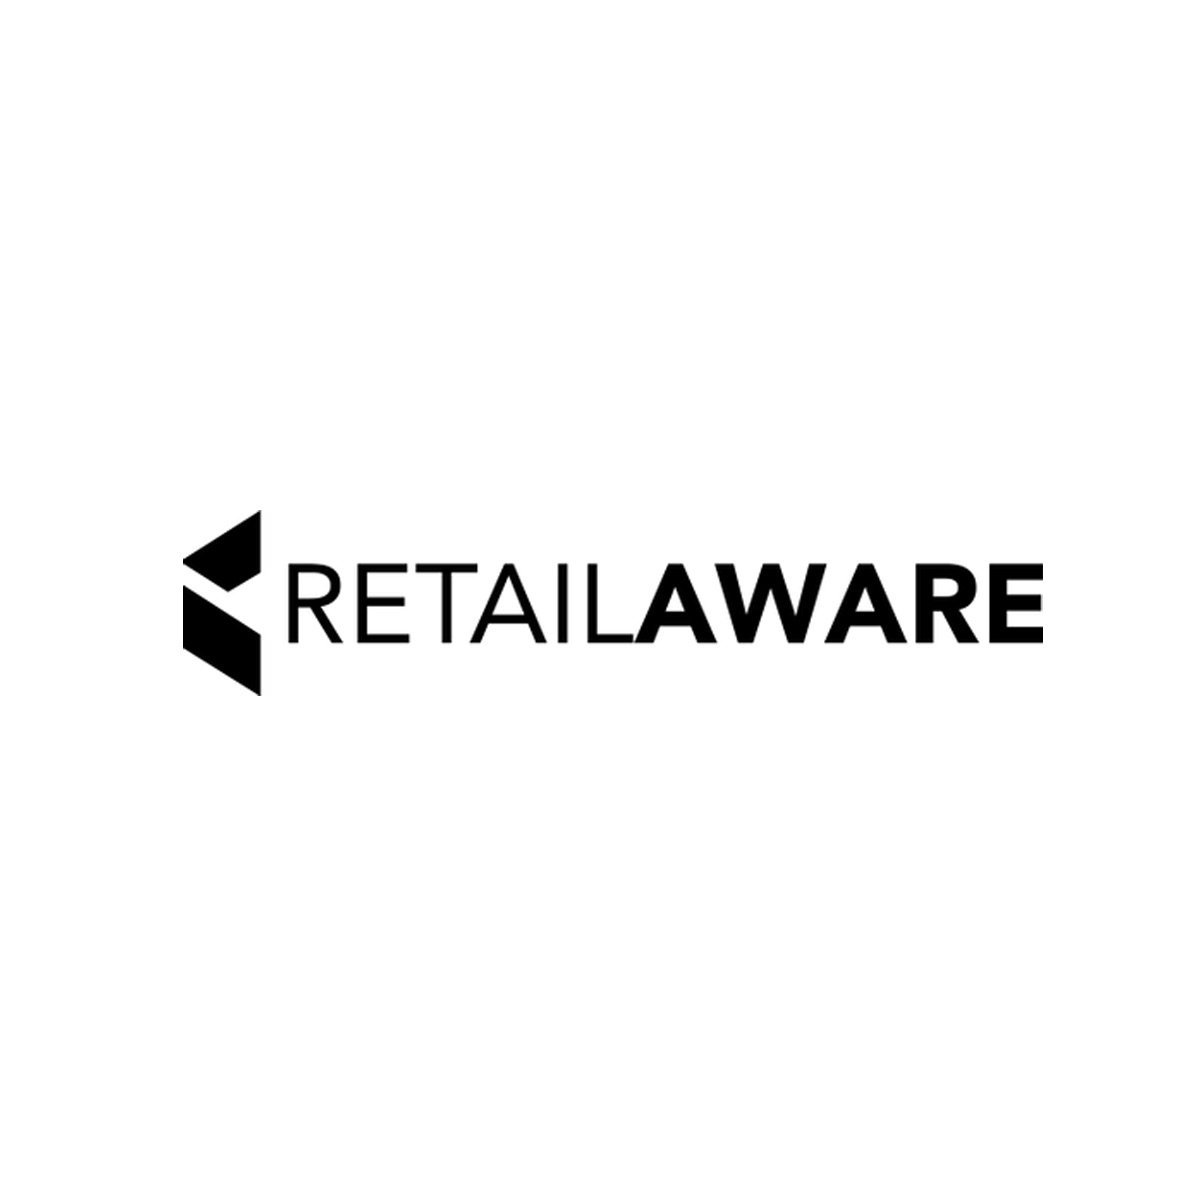 Retail Aware